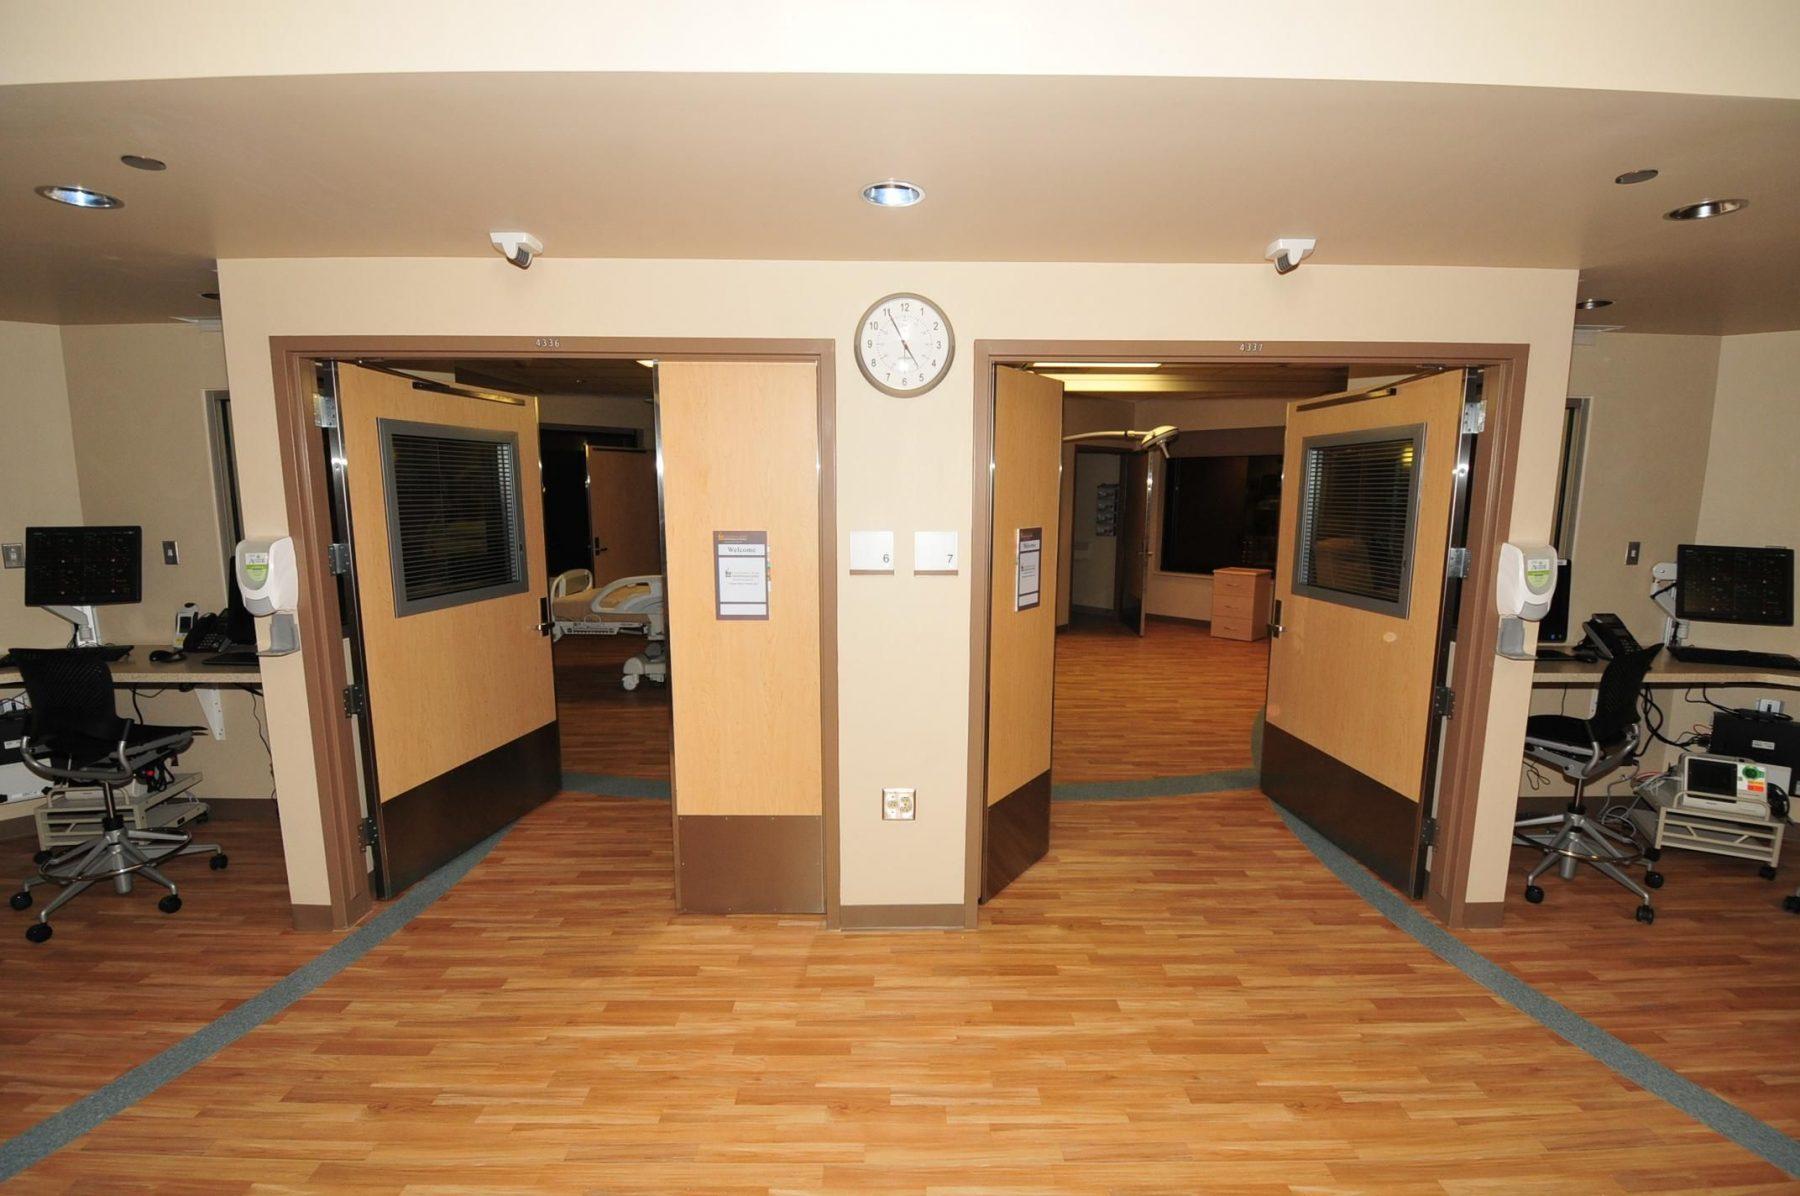 Pod 2 Room Entry